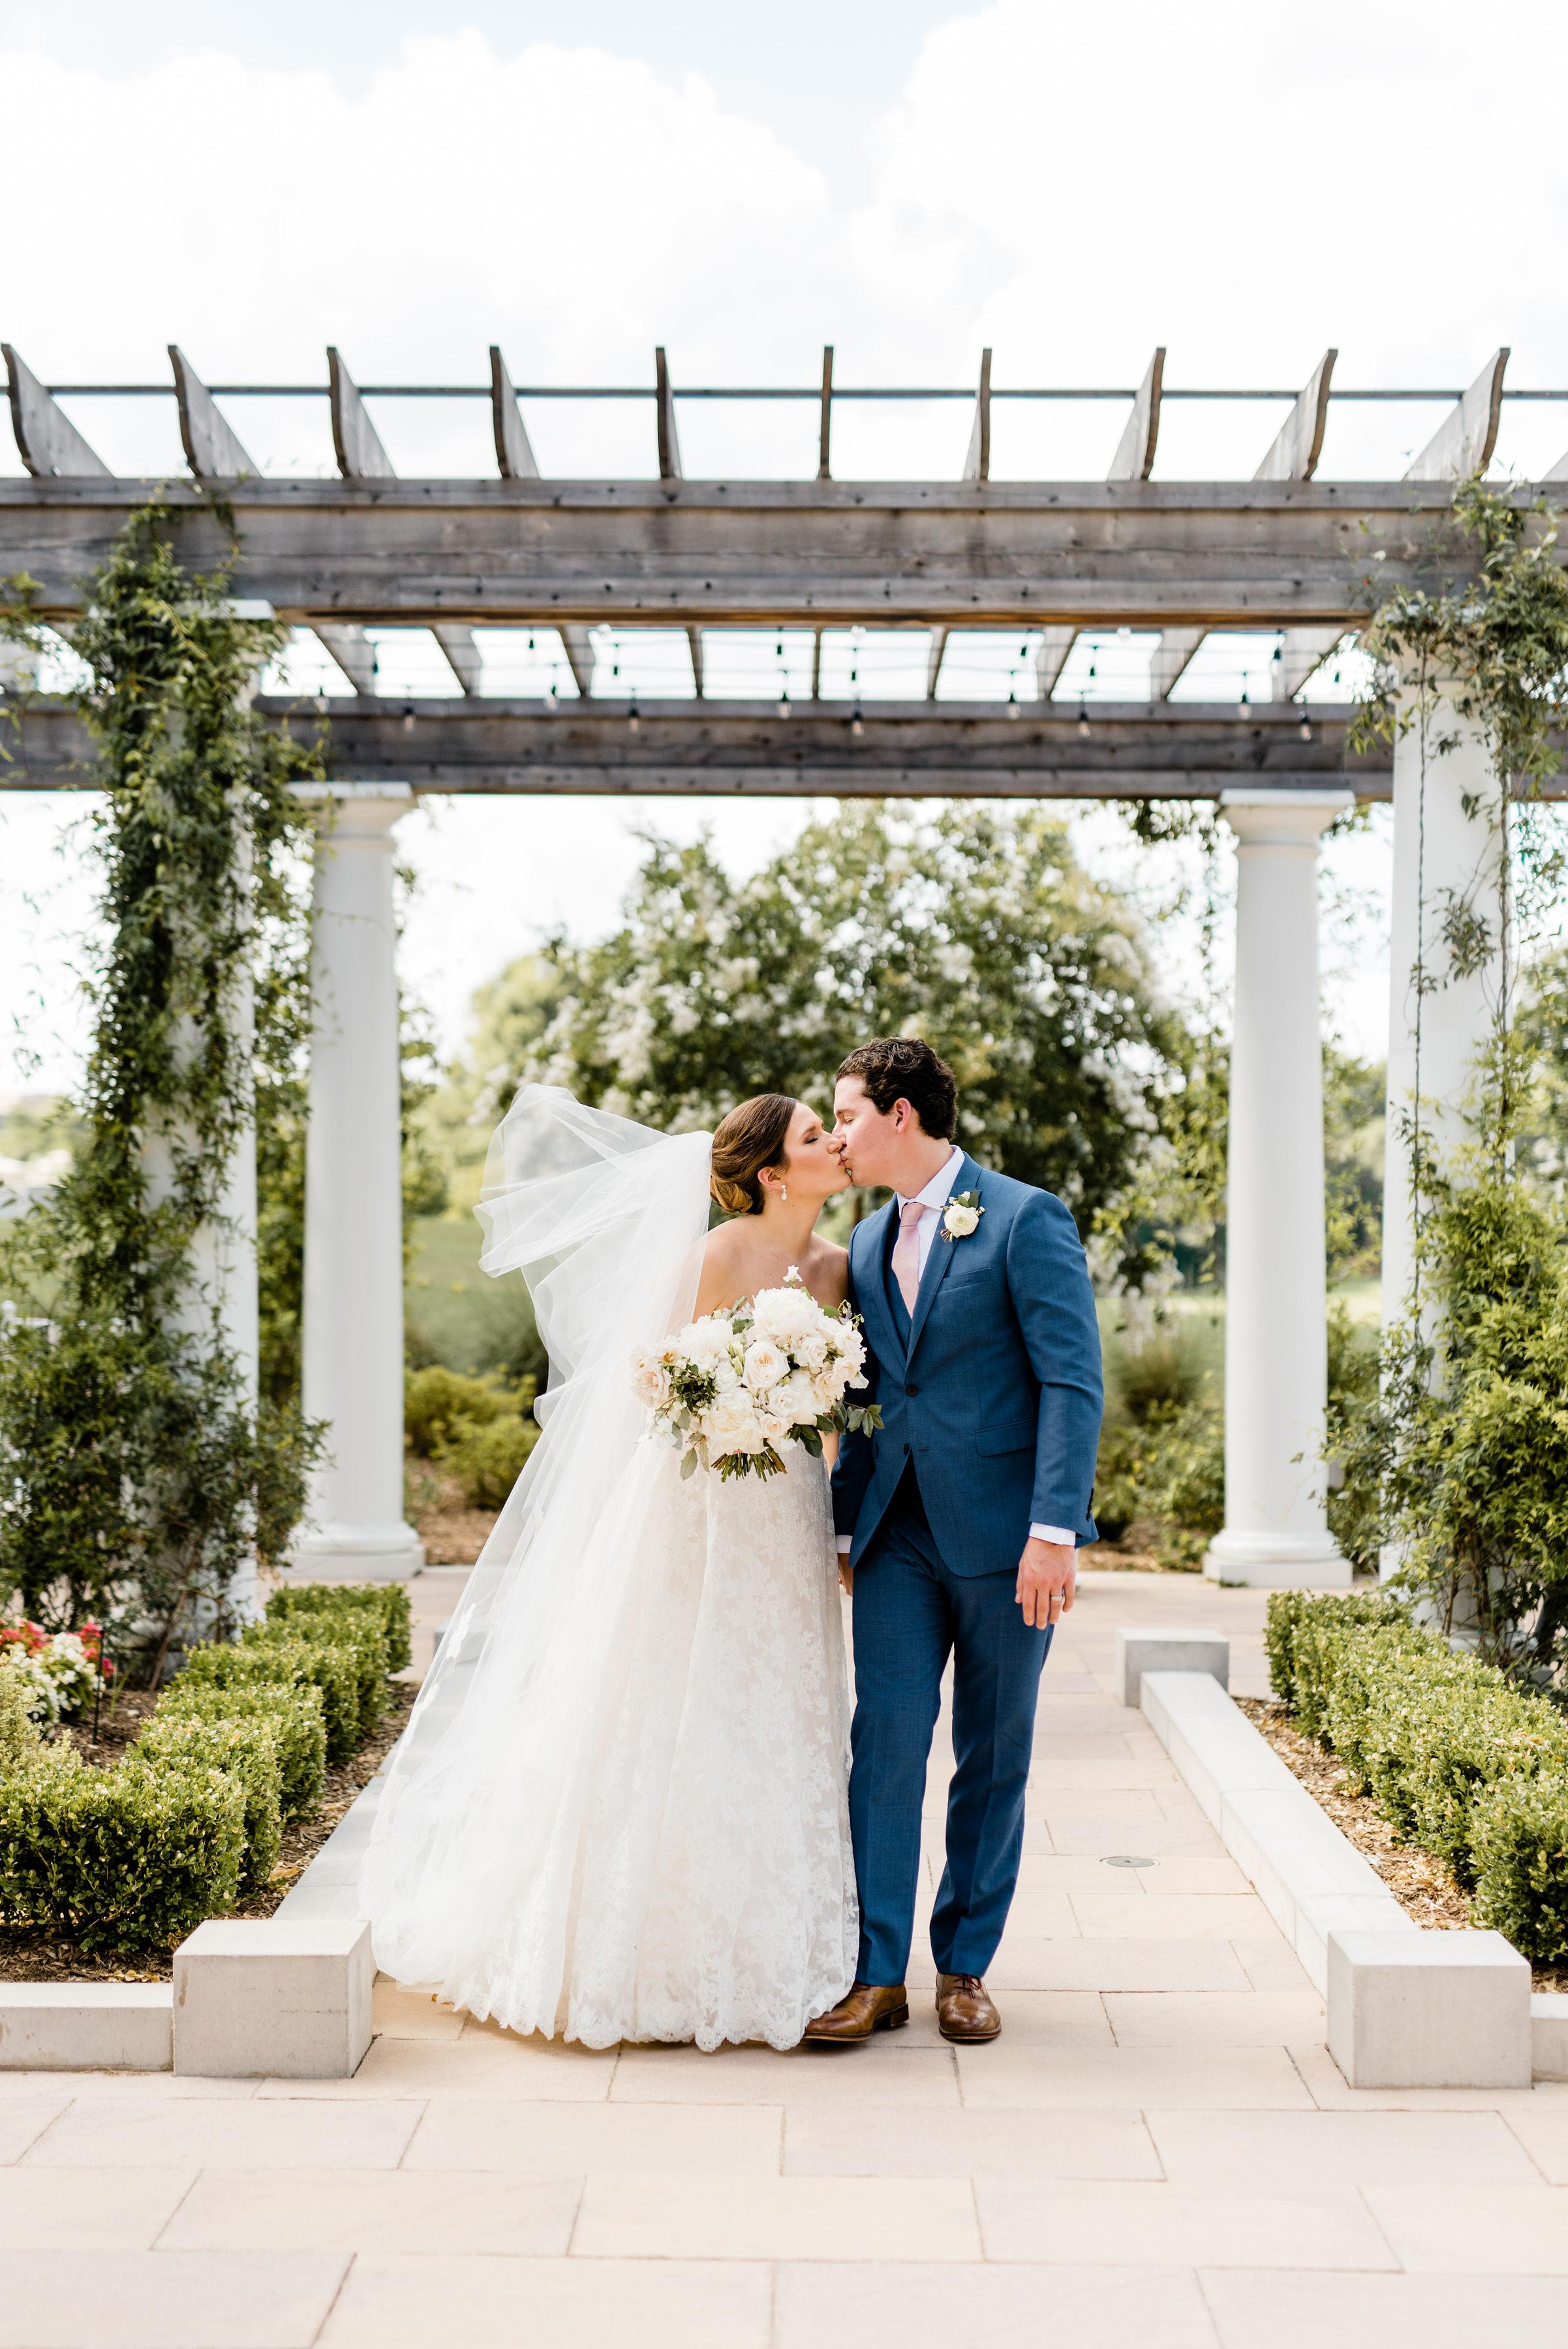 McElravey_Wedding_CarolineLimaPhotography_2018_215.jpg